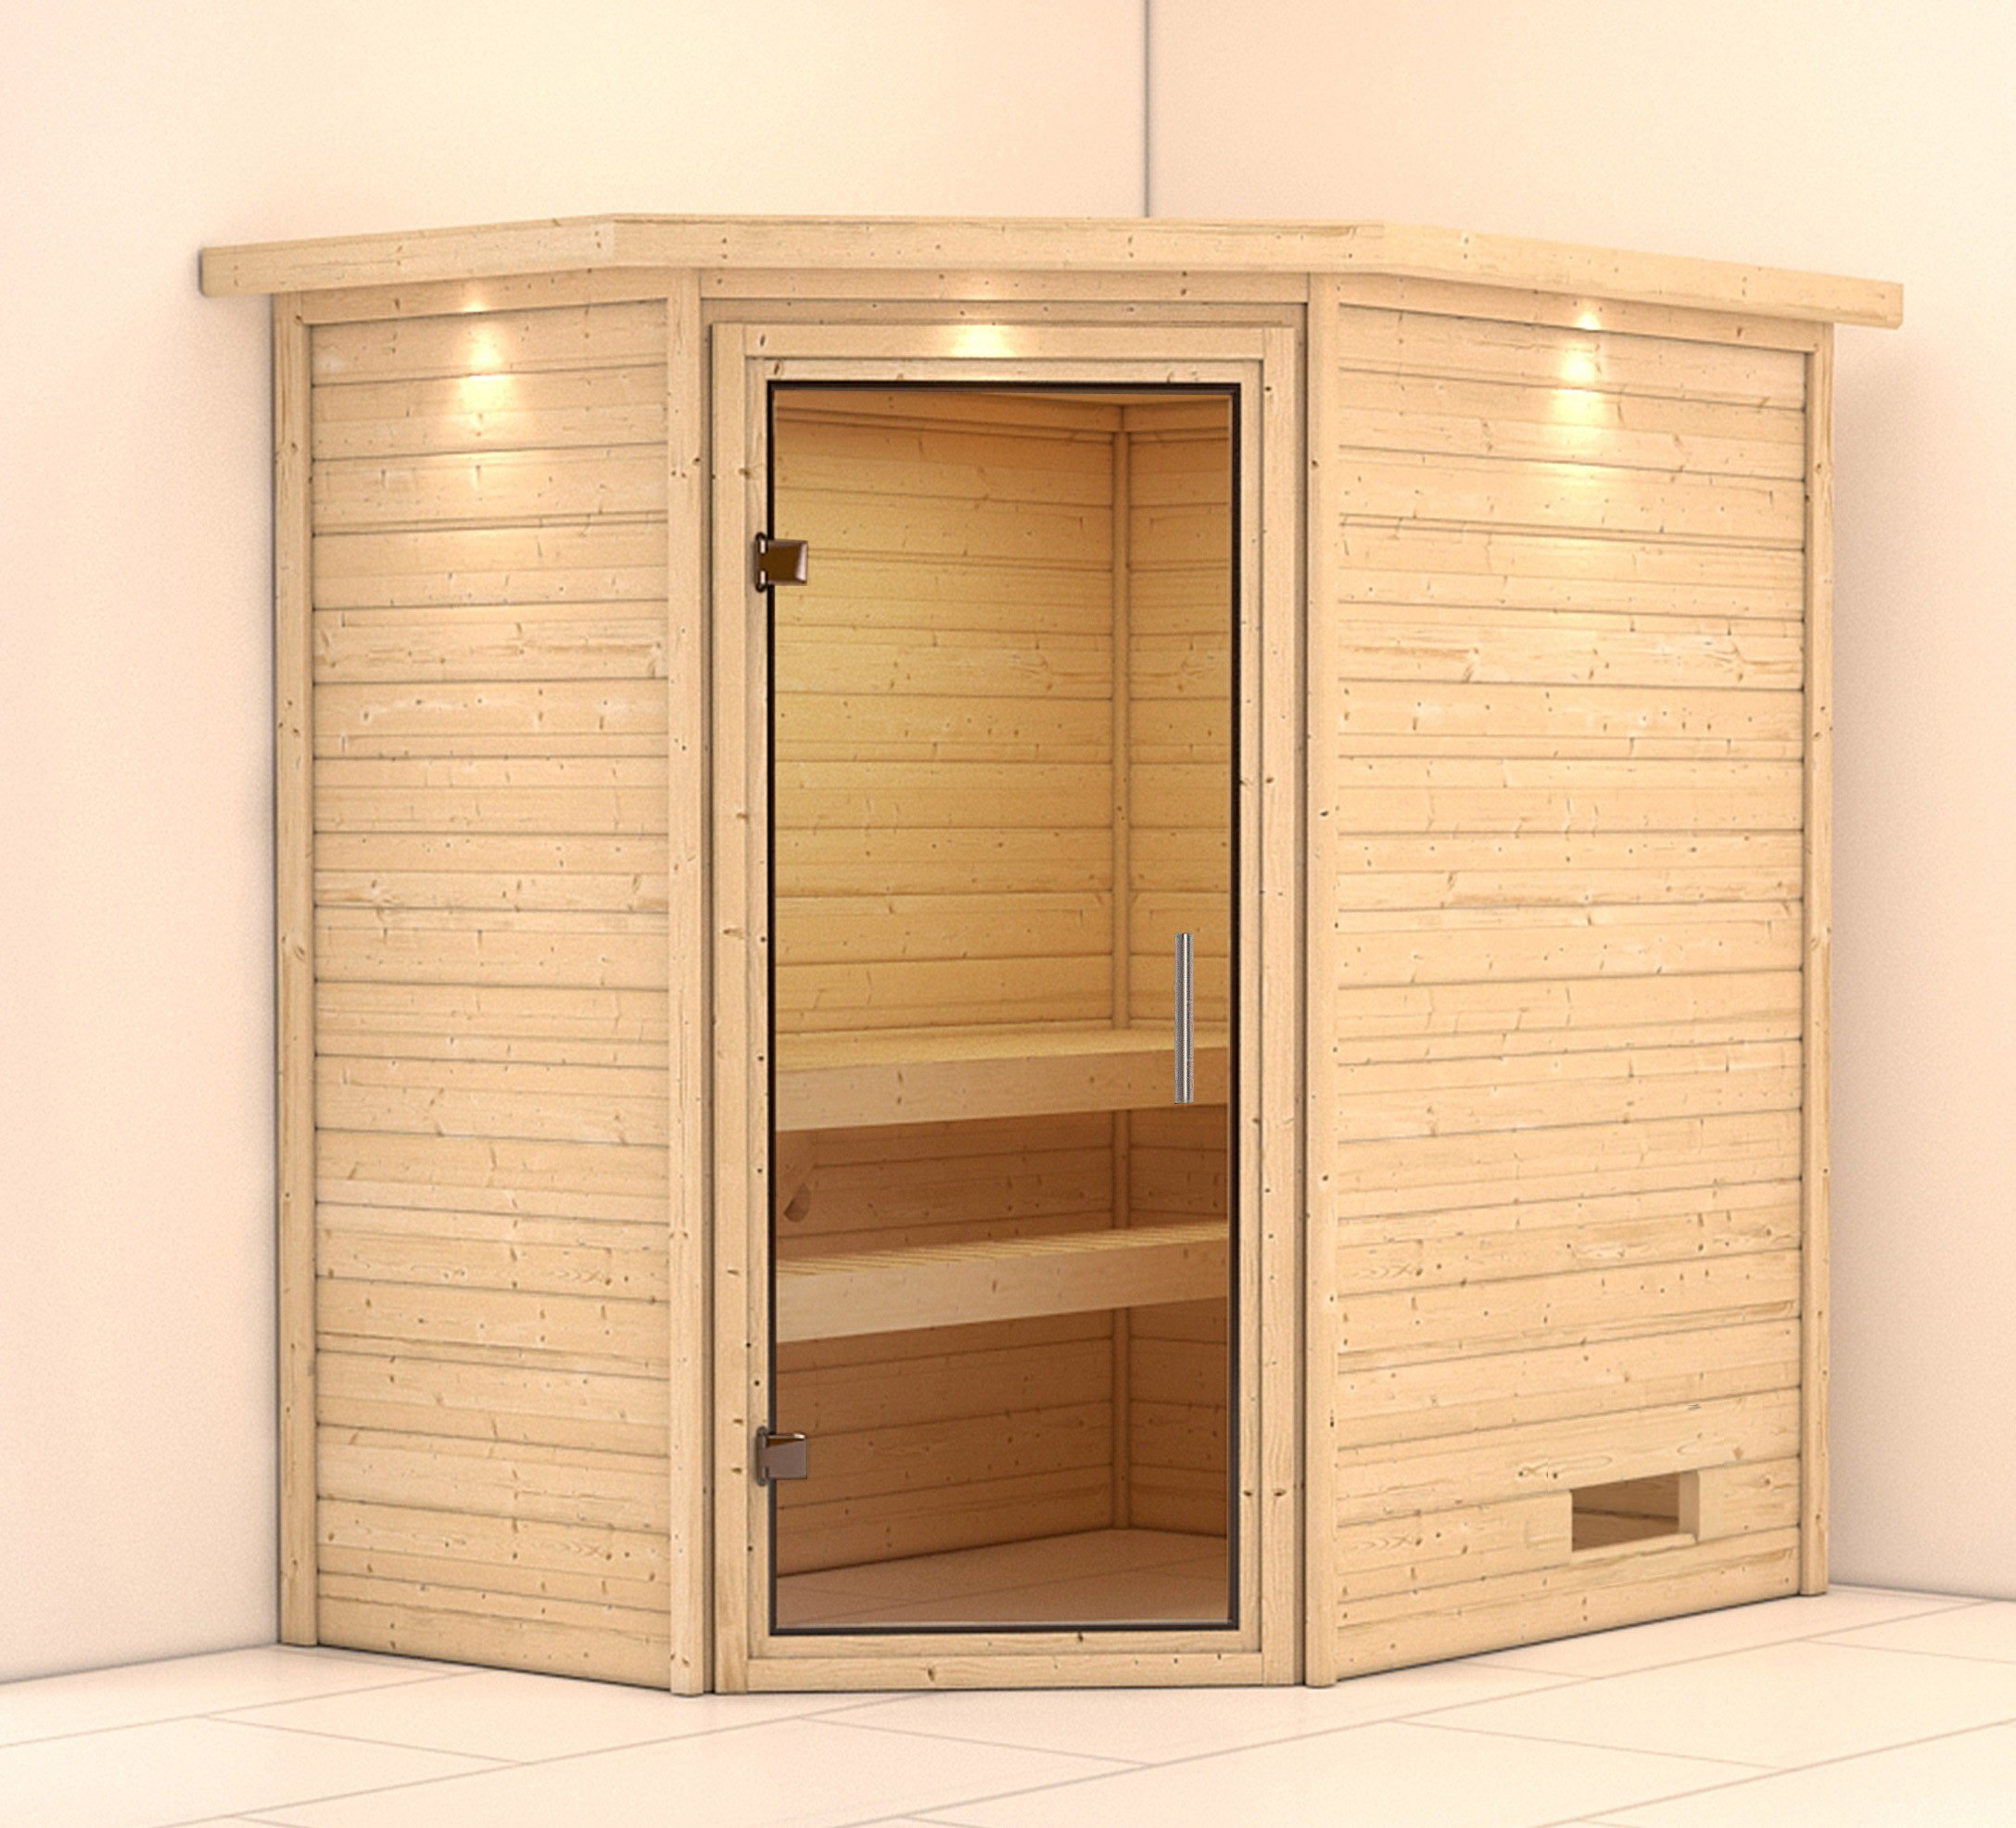 WoodFeeling Sauna Svea 38mm 230V Dachkranz ohne Ofen Klarglas Tür Bild 1